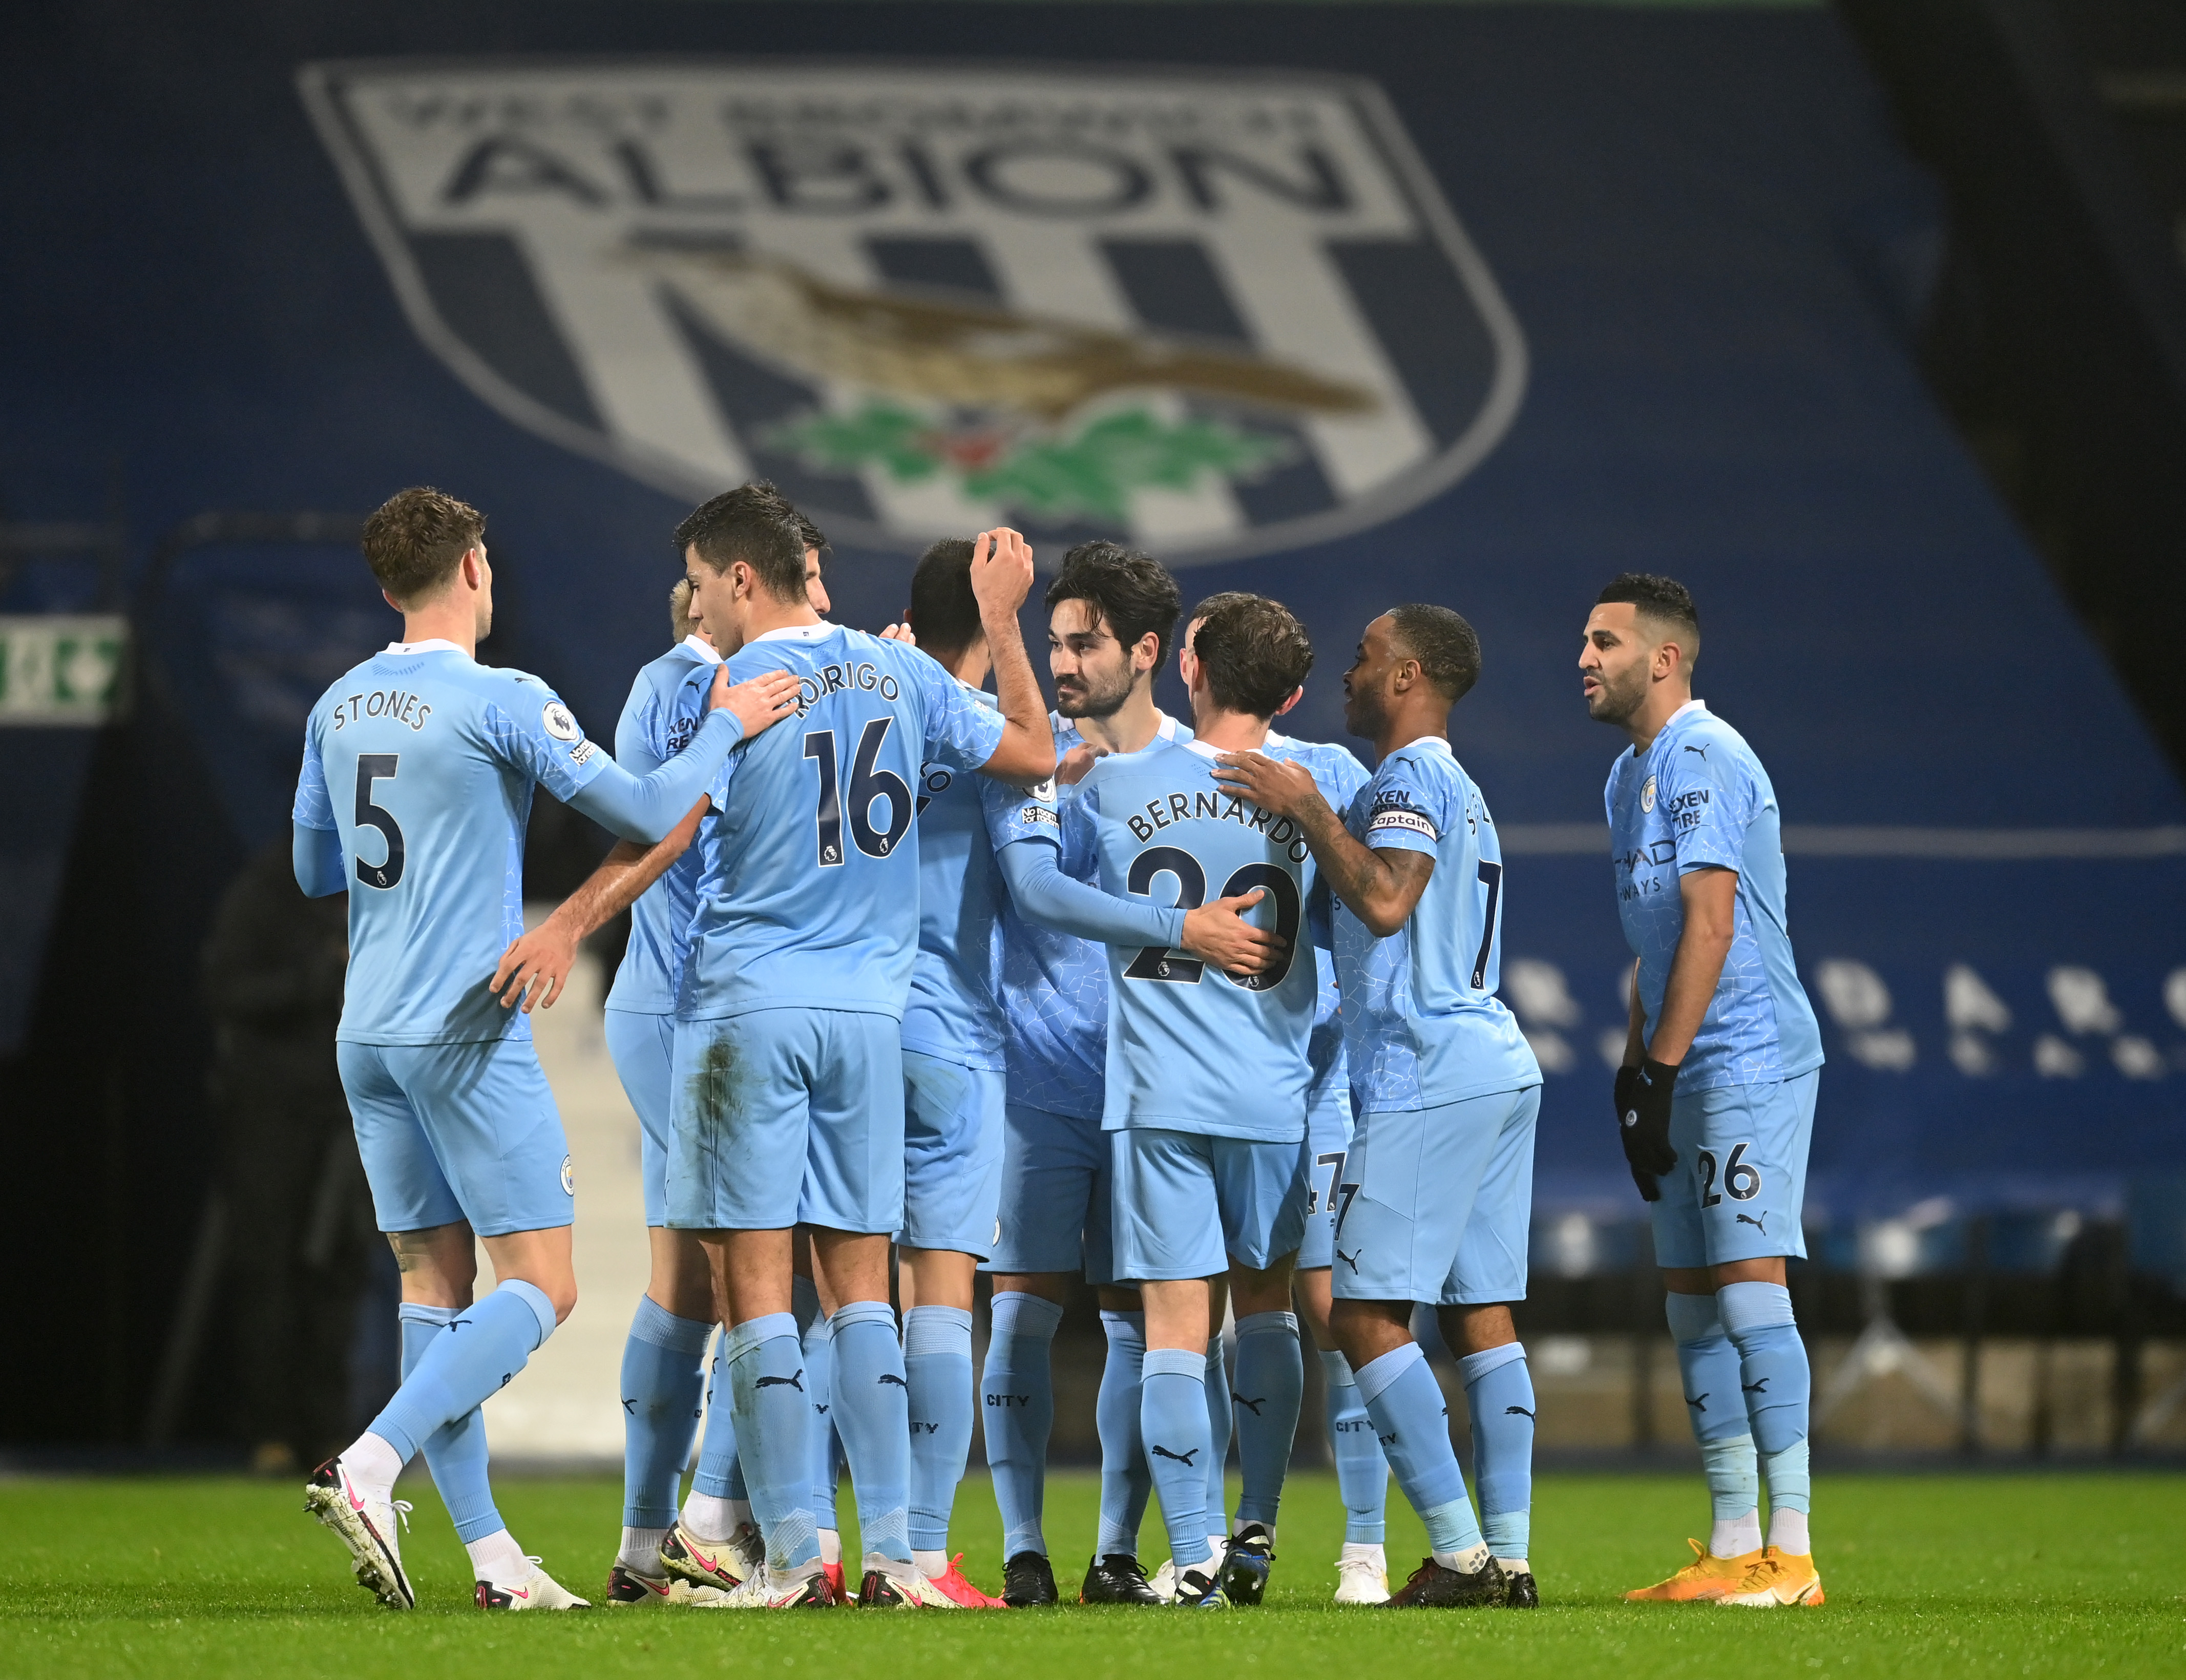 West Bromwich Albion V曼彻斯特市 - 英超联赛